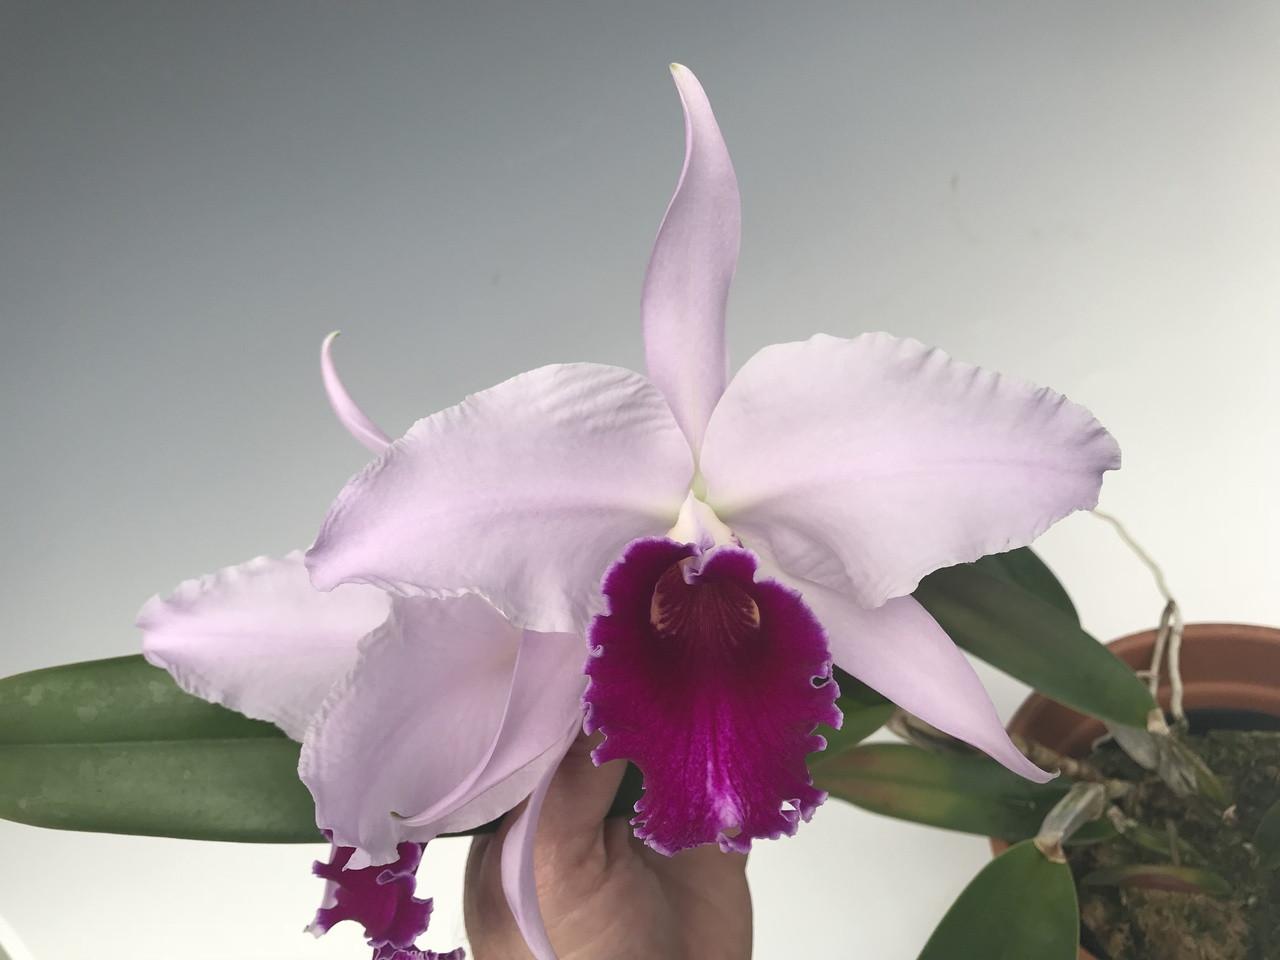 Cattleya Duvaliana (lueddemanniana coerulea x purpurata semi-alba 'Red Carmin')